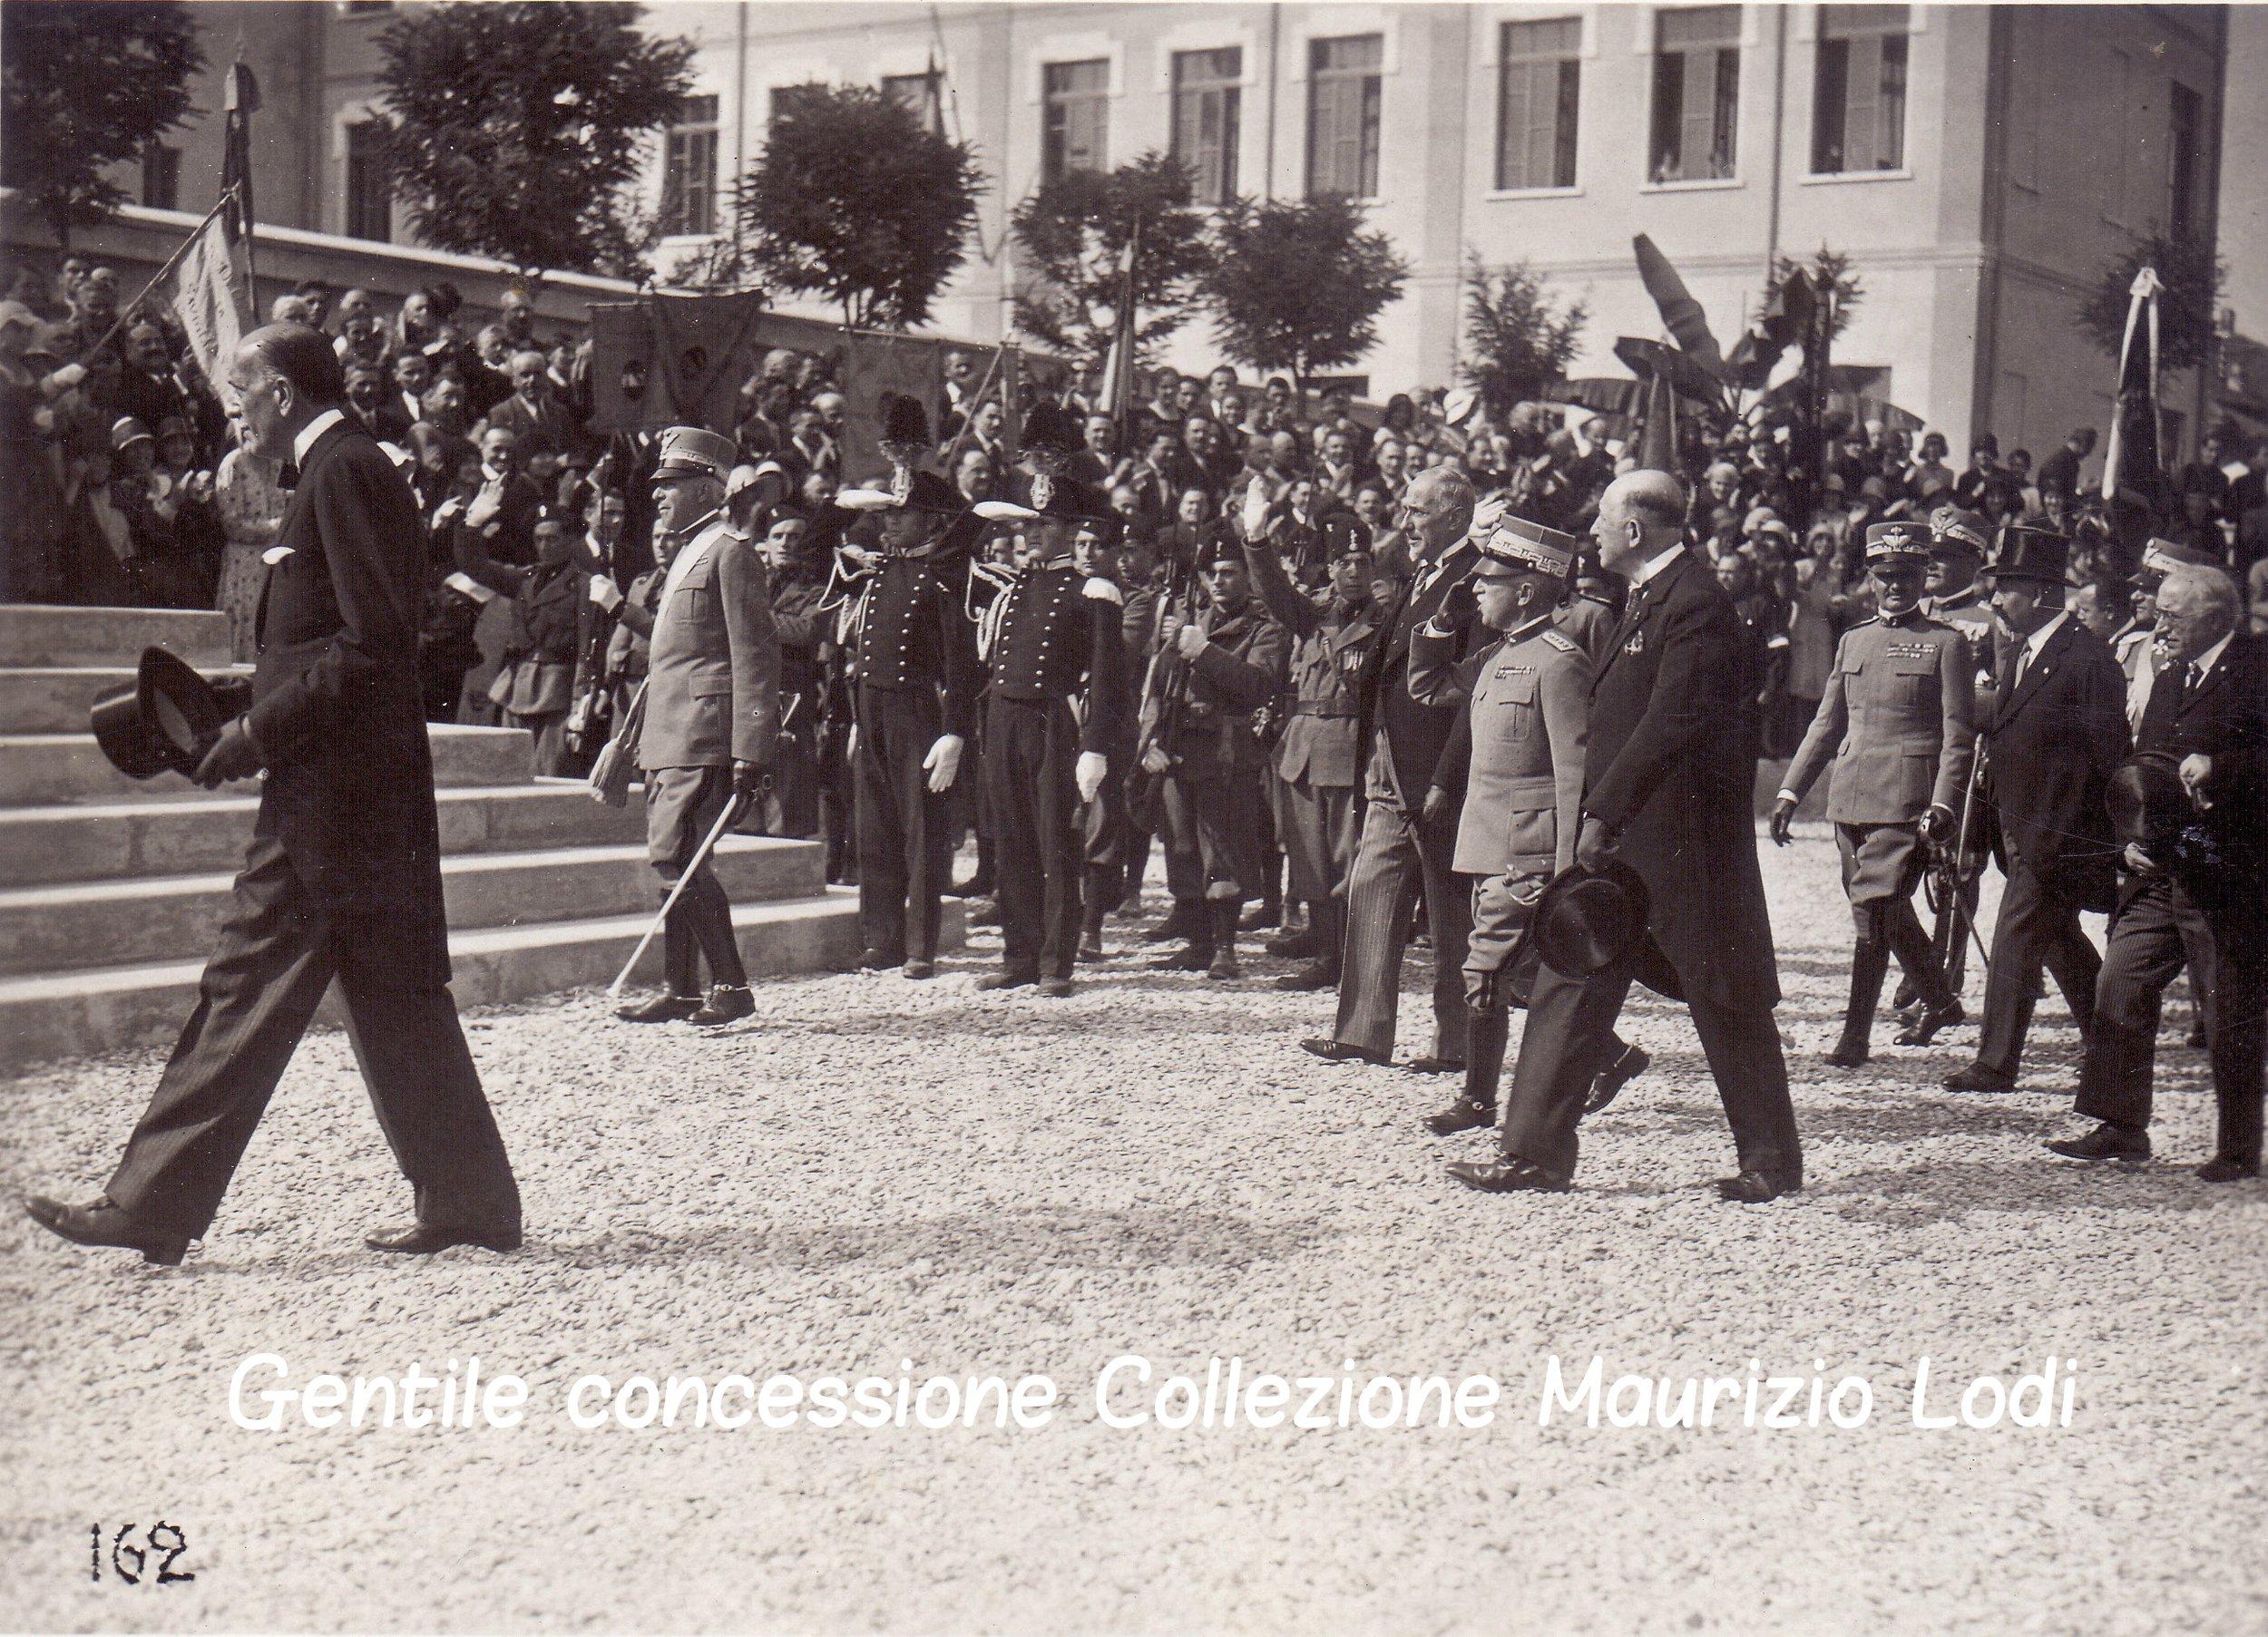 savigliano CN il re inaug mon caduti disp GG 31 8 1930 (c).jpg